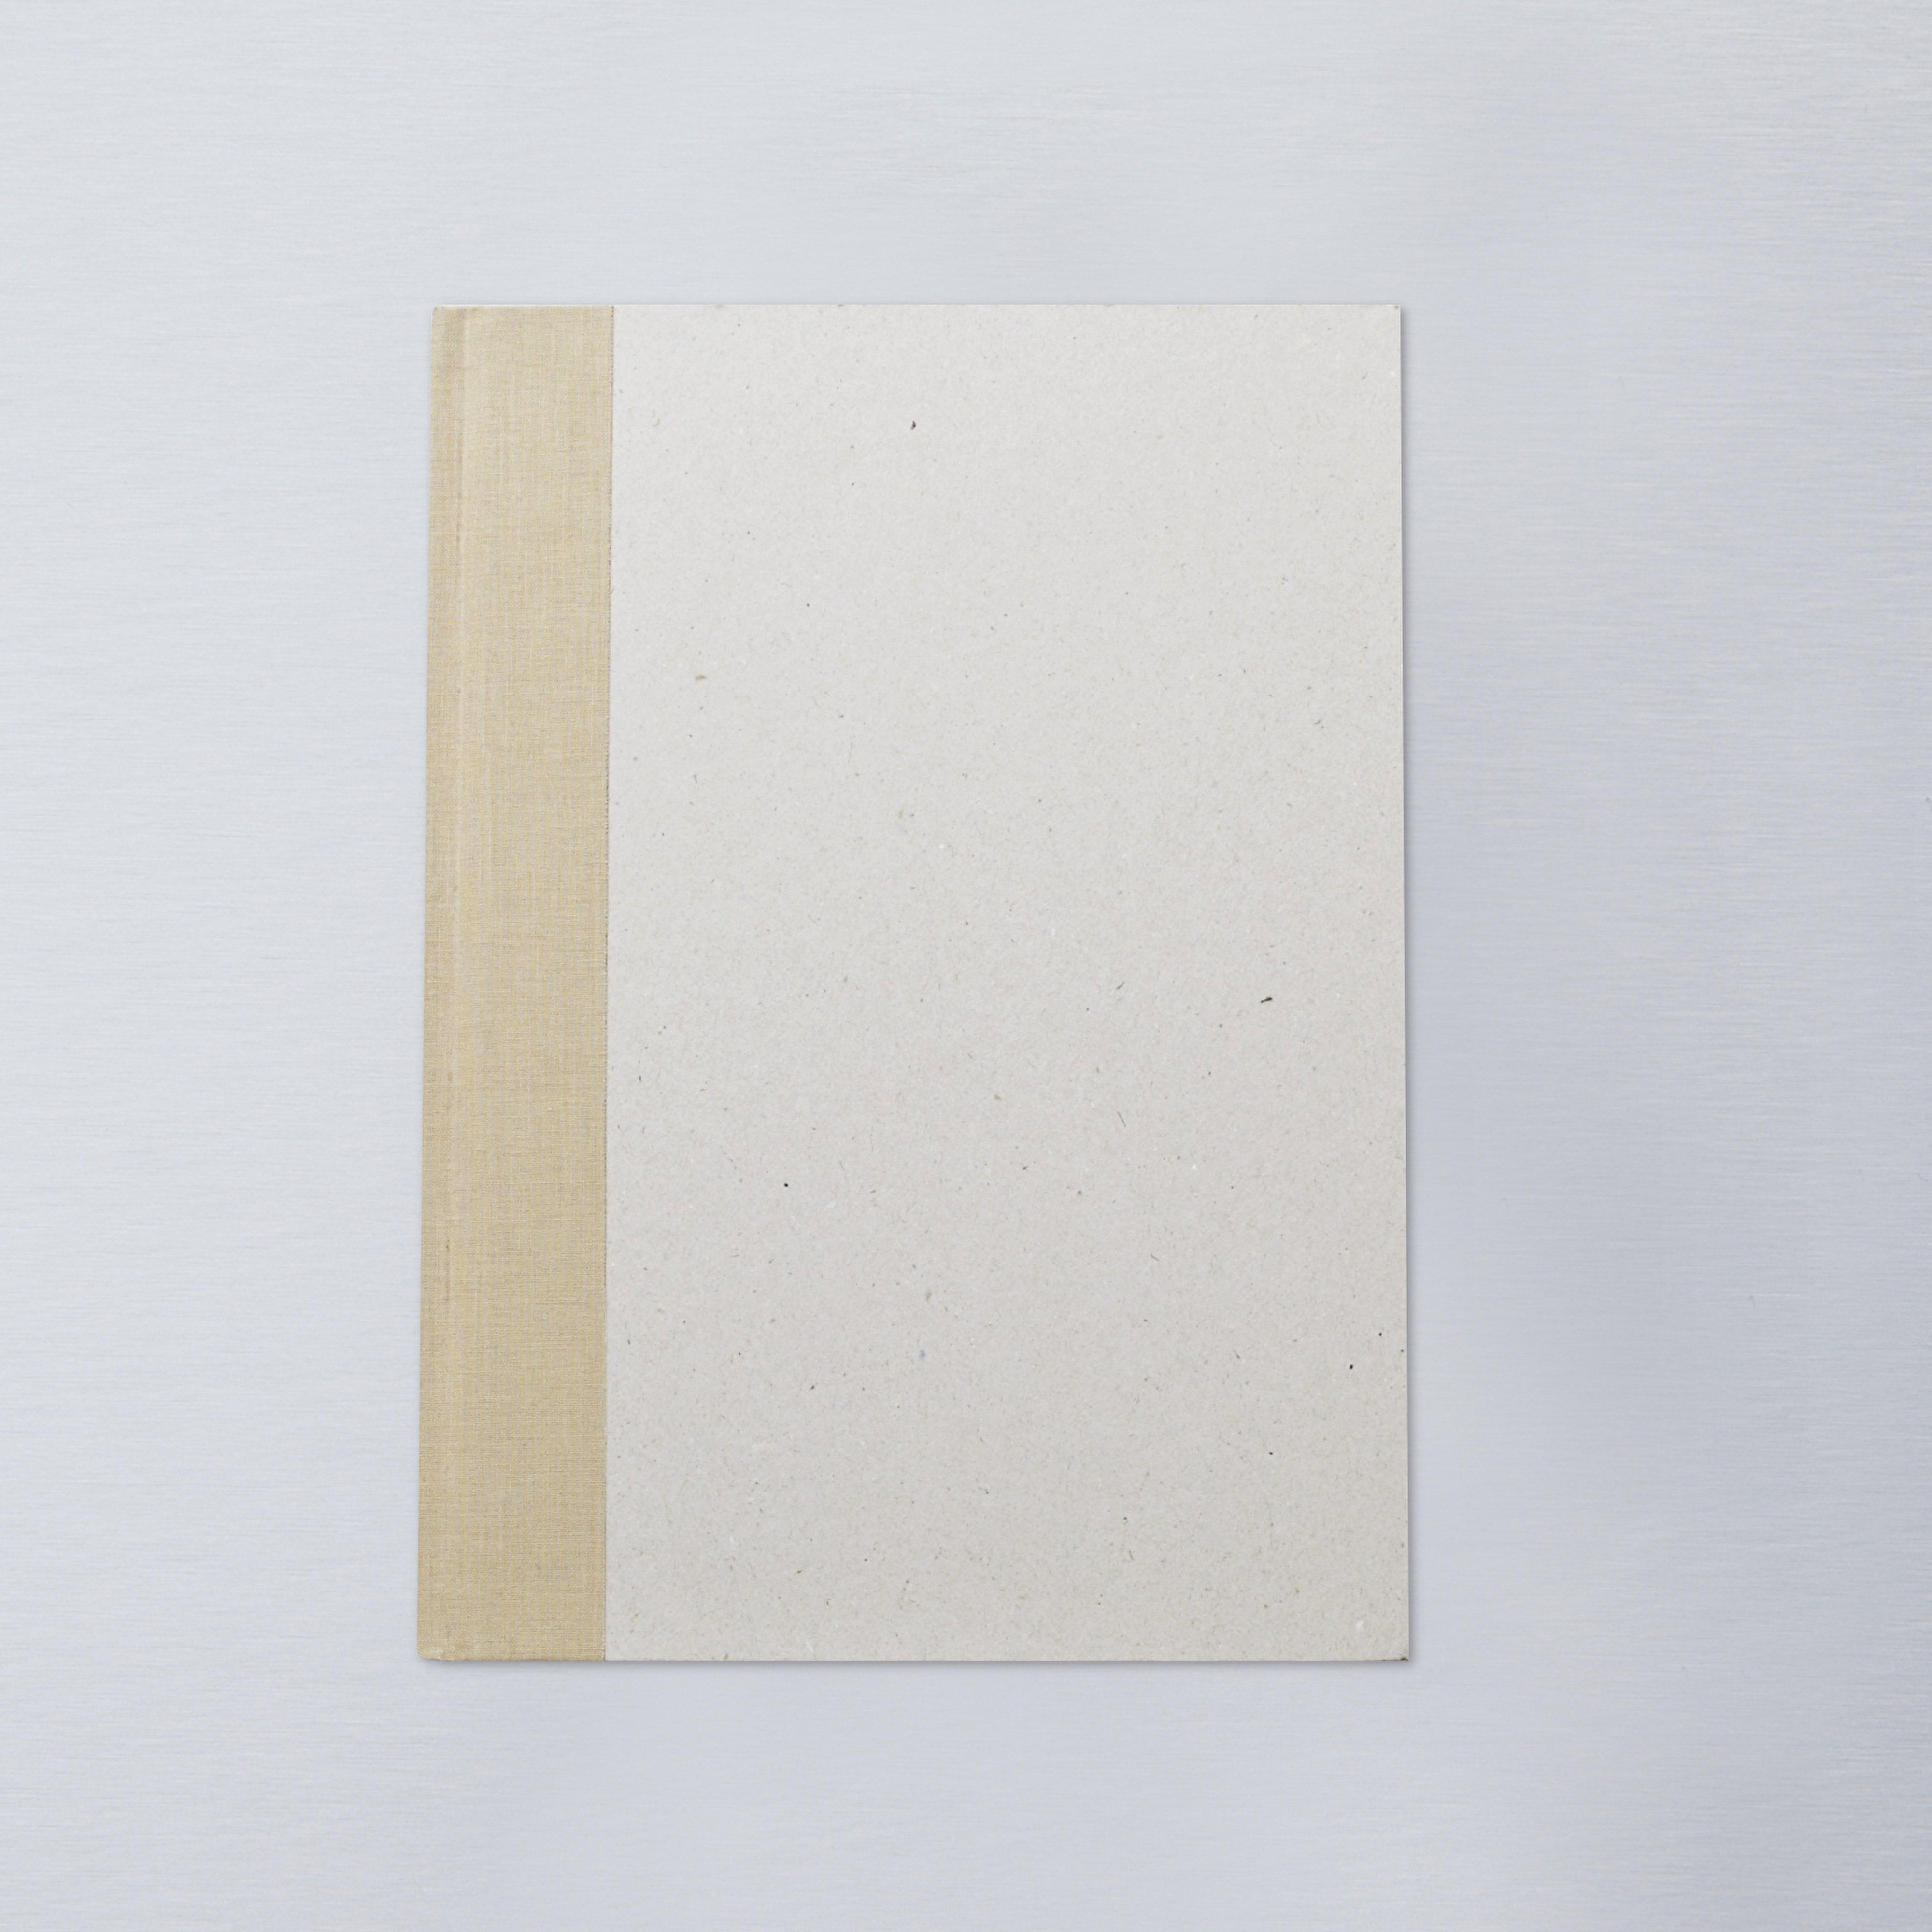 Seawhite Portrait Sketch Book 140gsm 92 Pages A4